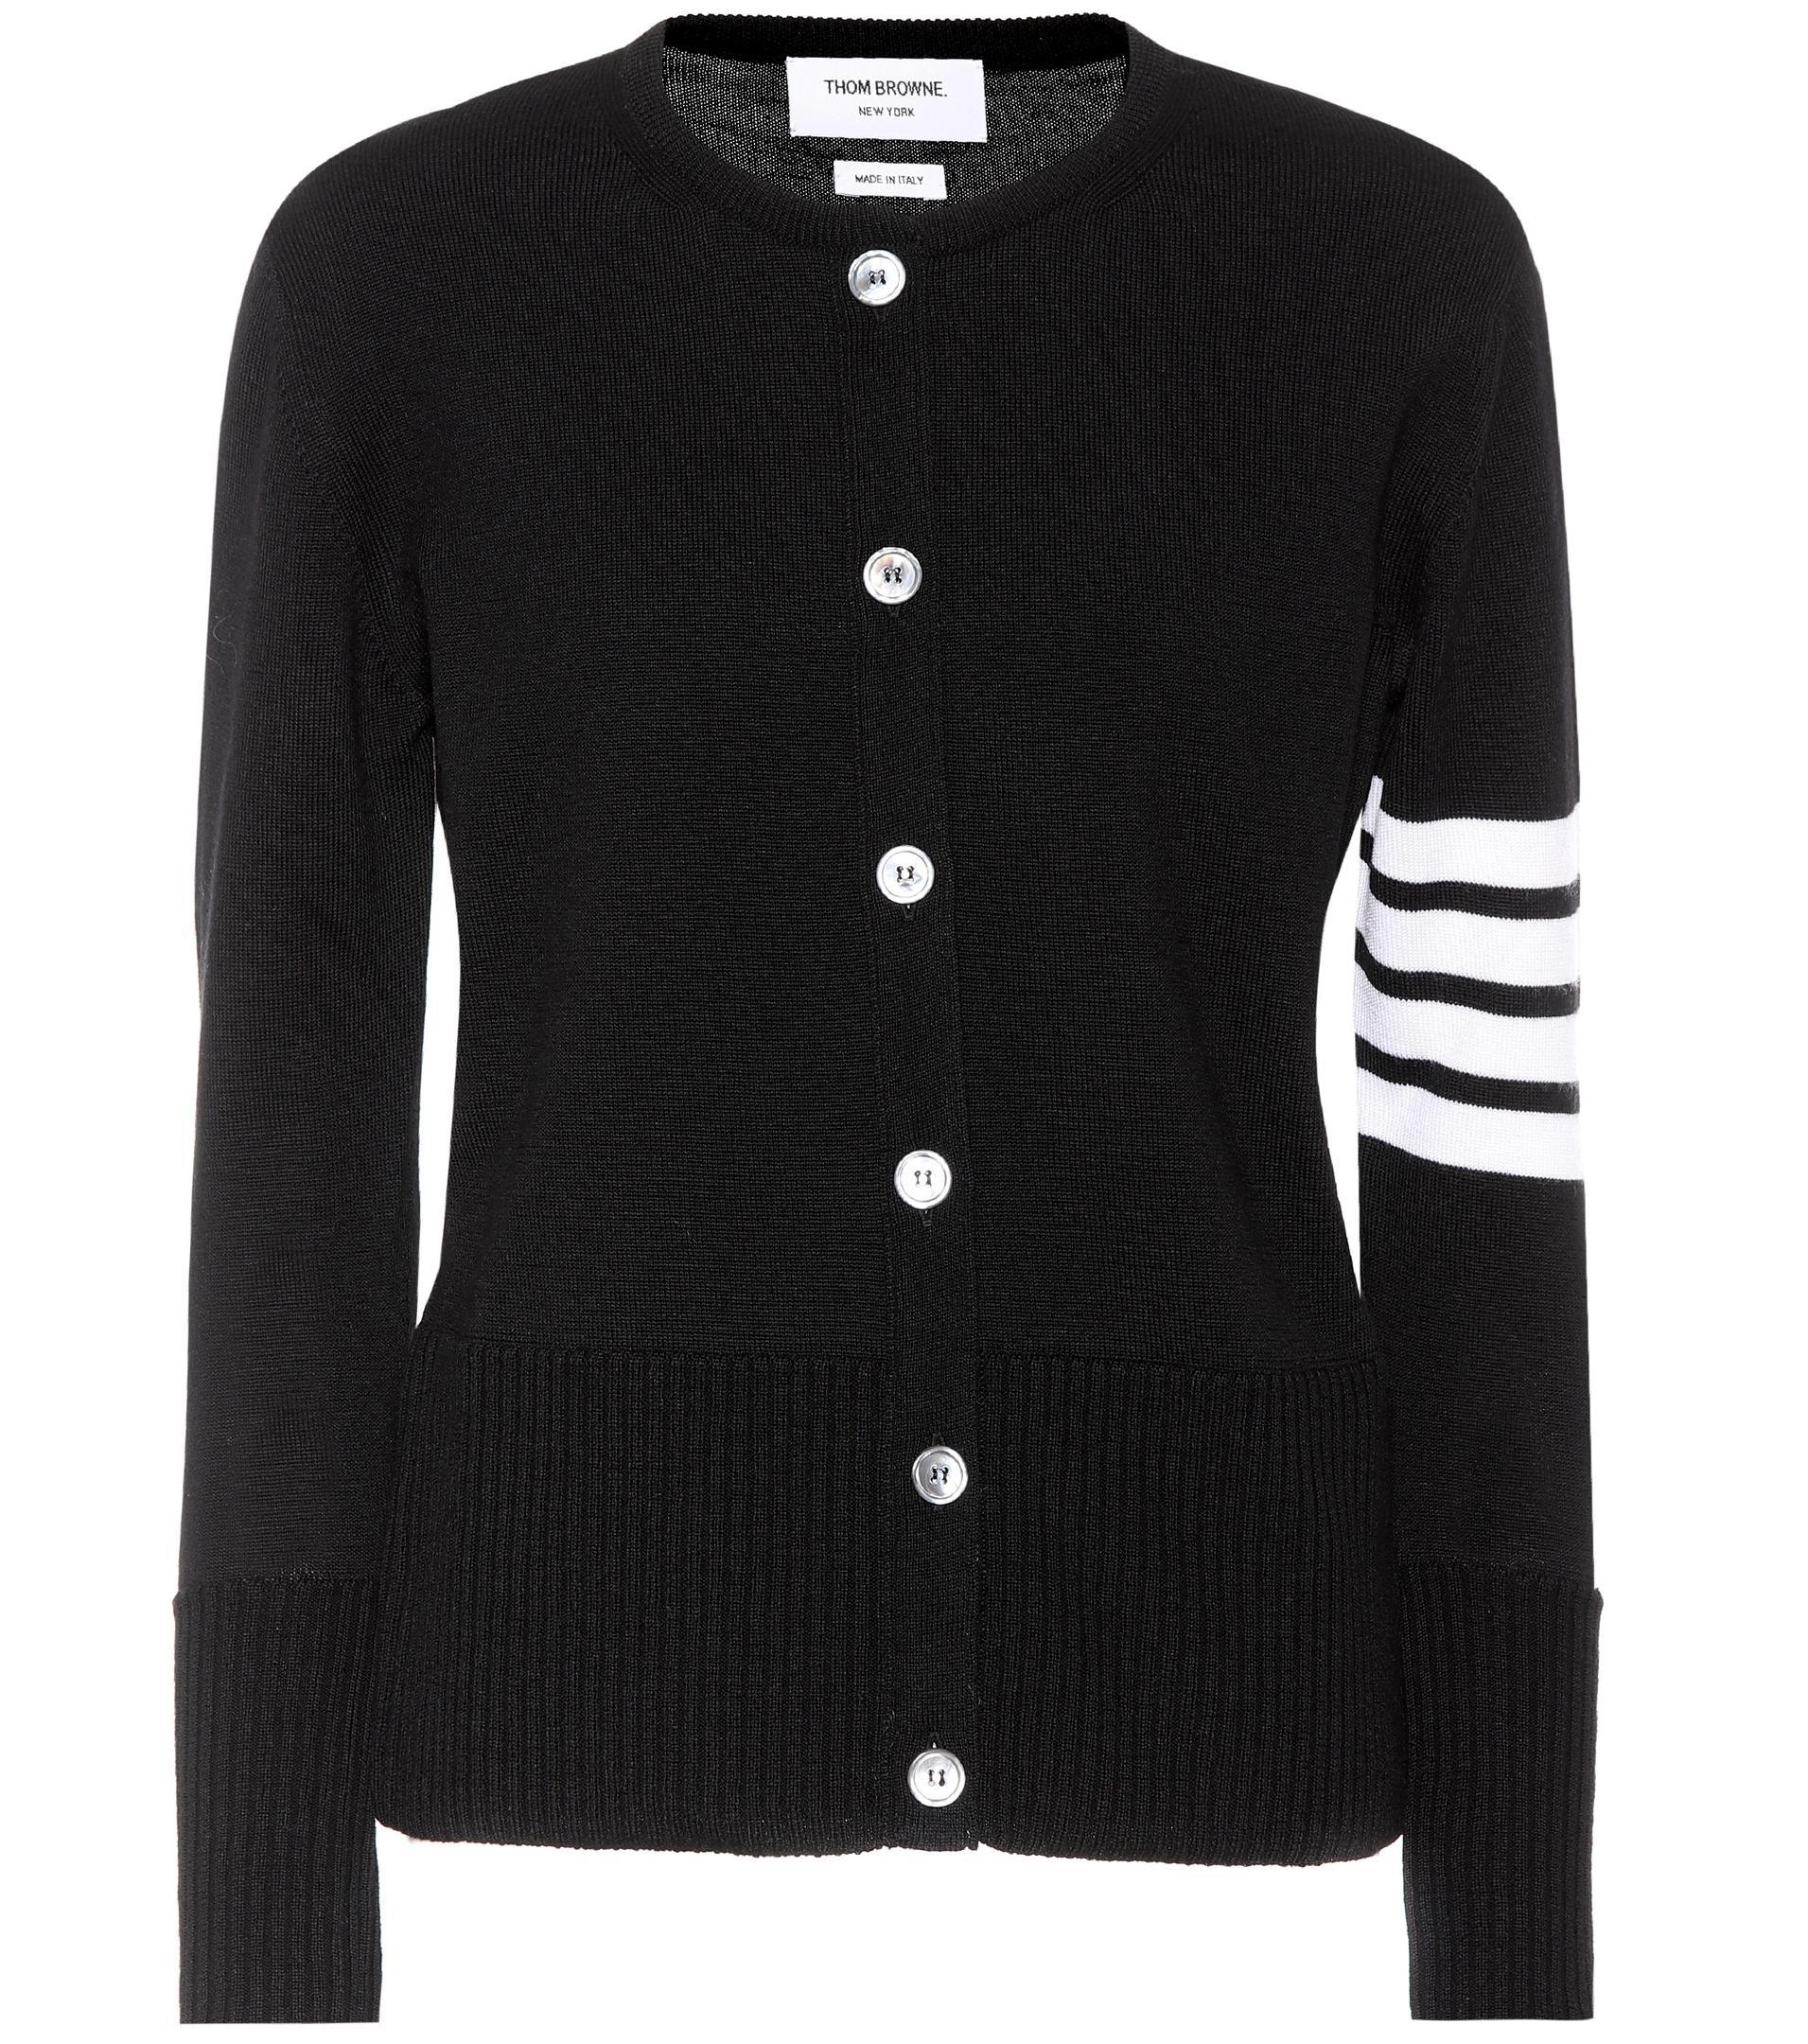 Thom browne Merino Wool Cardigan in Black | Lyst